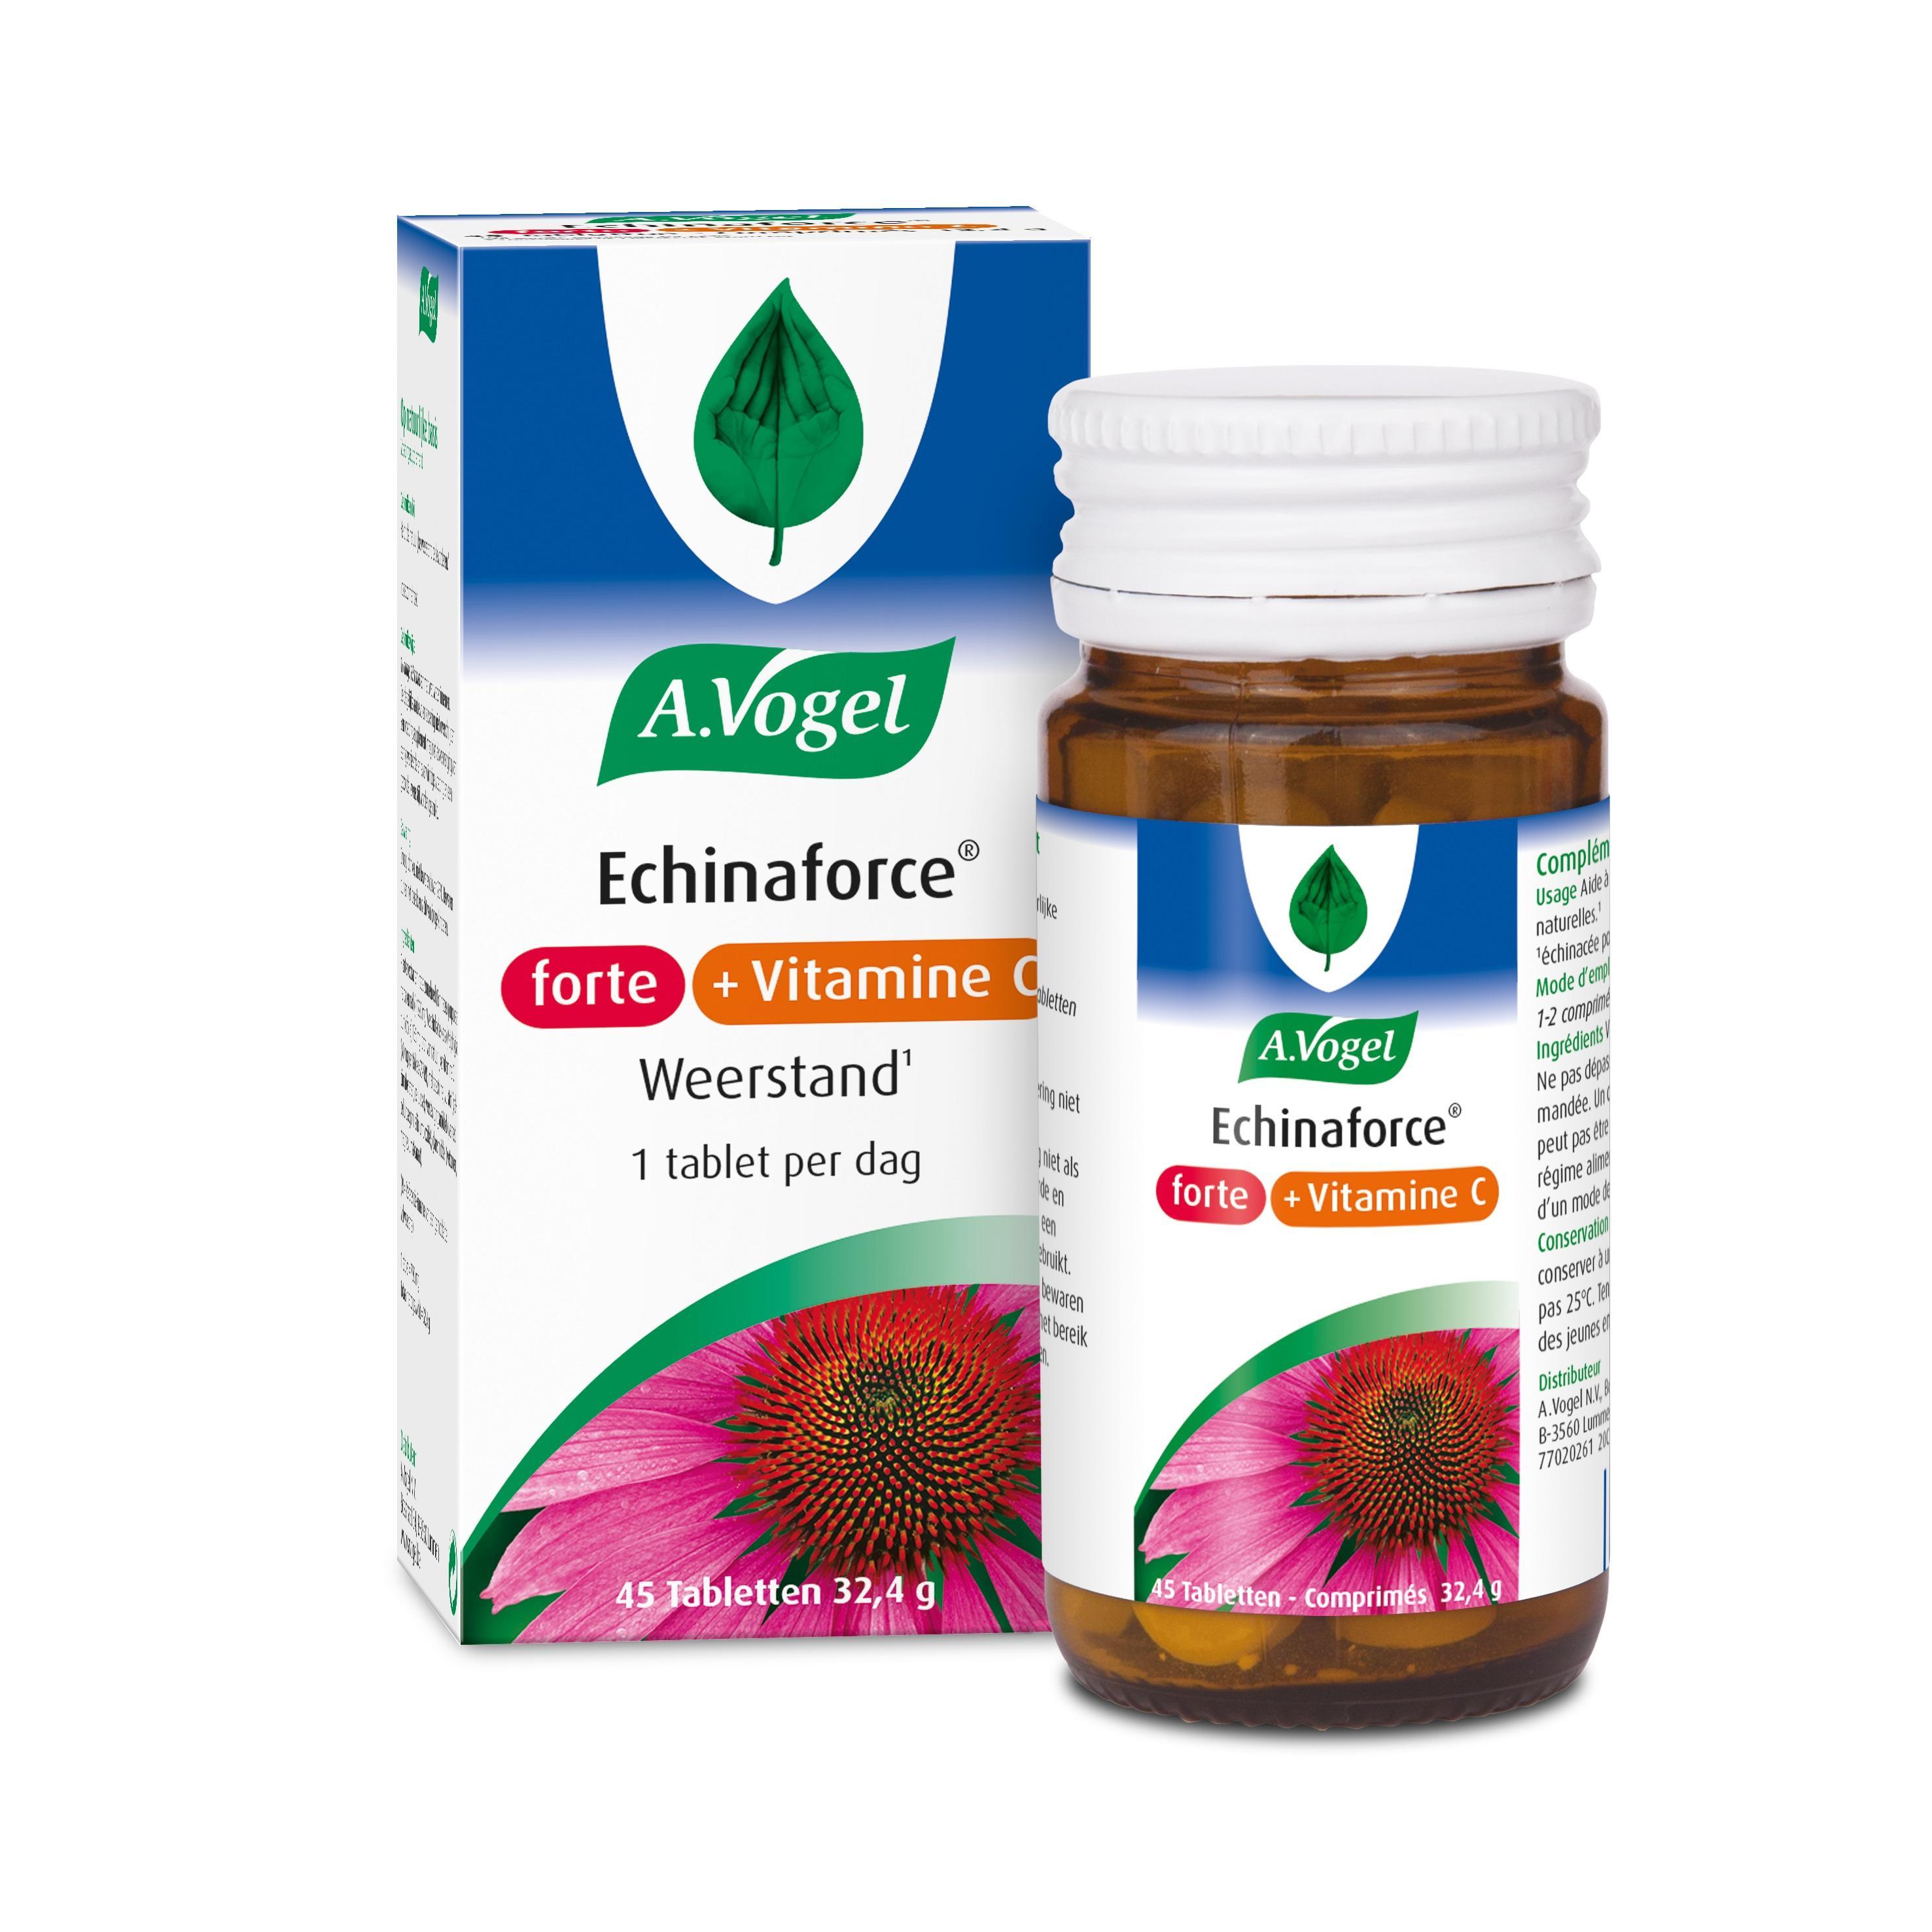 A.Vogel Echinaforce Forte + Vitamine C